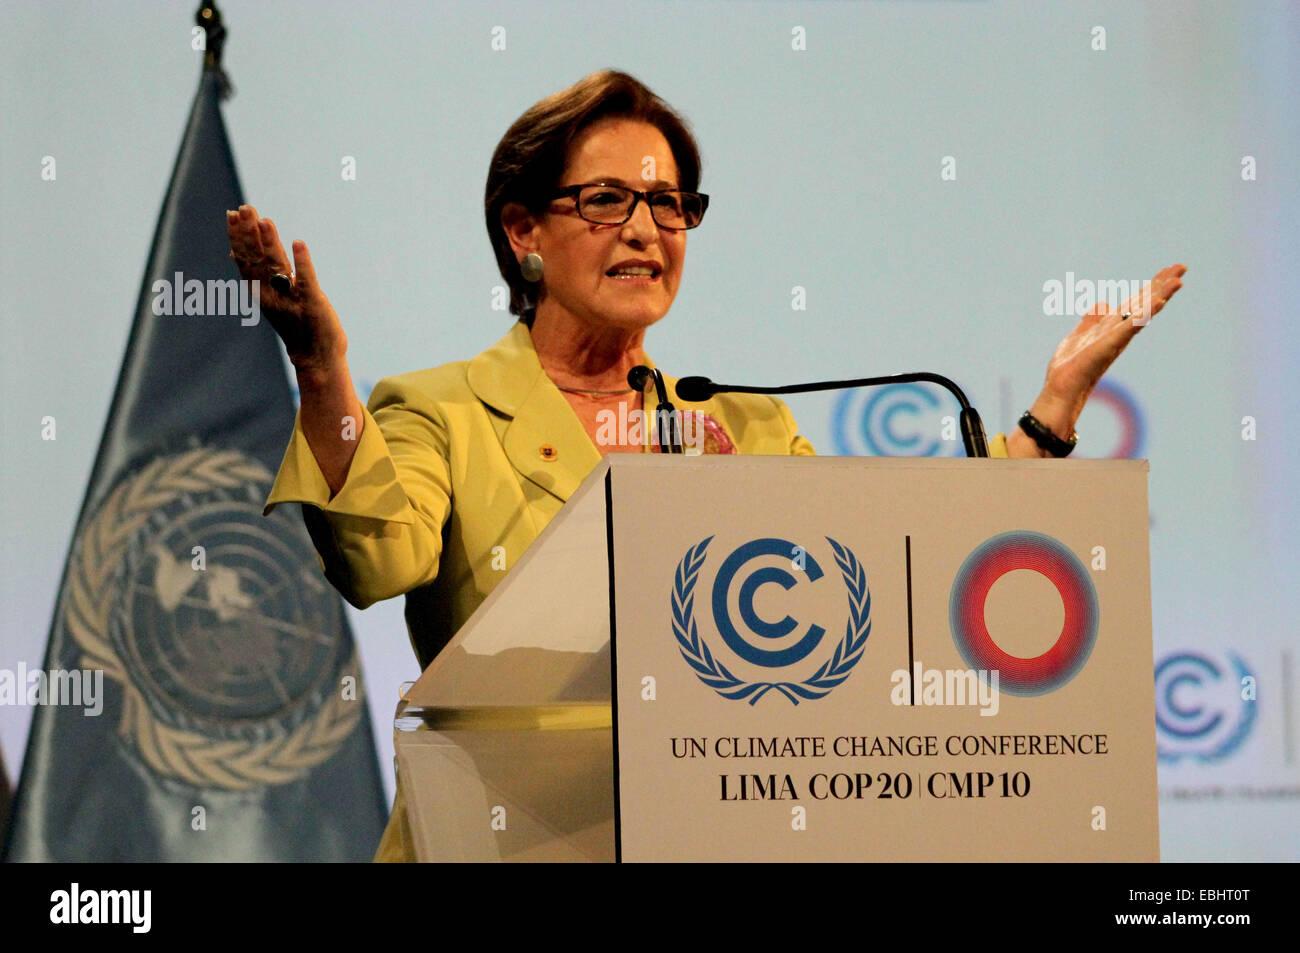 Lima, Perú. El 1 de diciembre de 2014. El alcalde de Lima Susana Villarán pronuncia un discurso durante Imagen De Stock